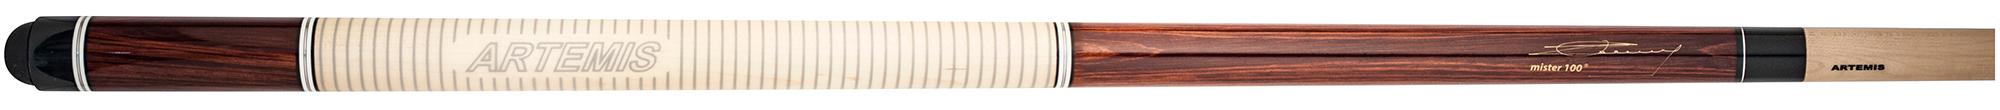 CK0200-06: Artemis Mister 100 Redwood 3D grip #1